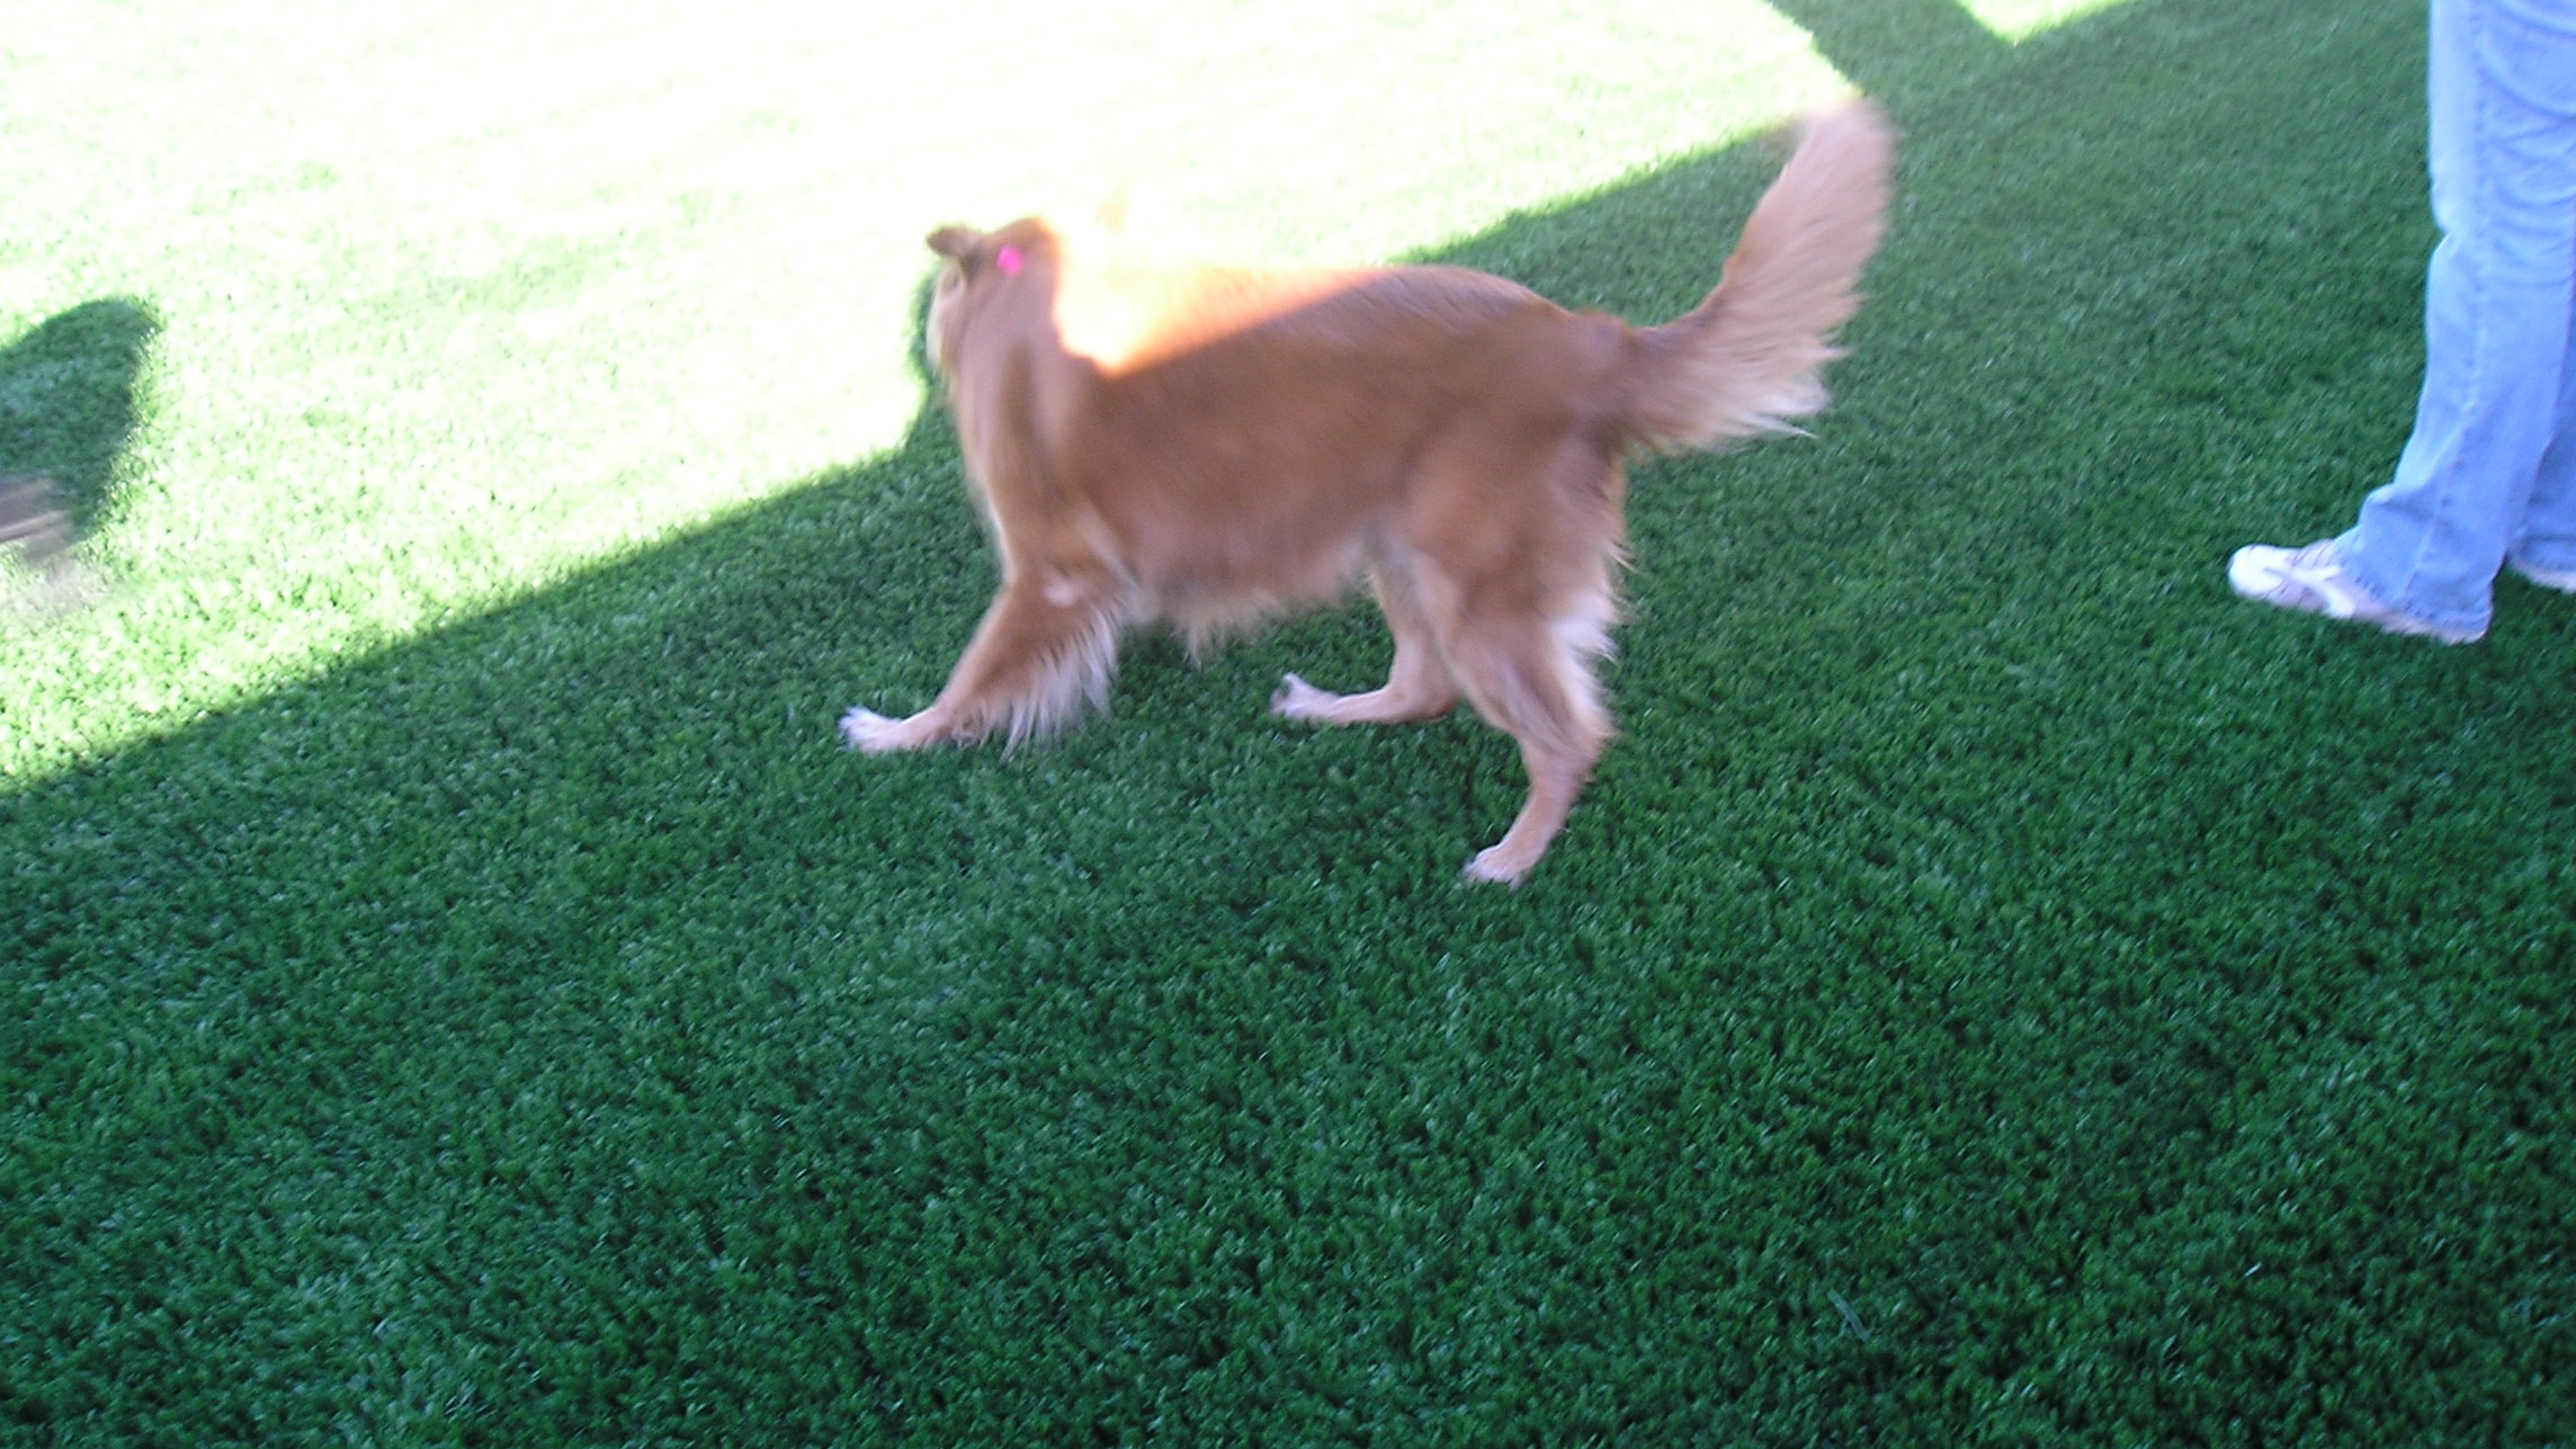 Pet Turf artificial turf for dogs,pet turf,dog turf,artificial turf for sale,artificial turf grass